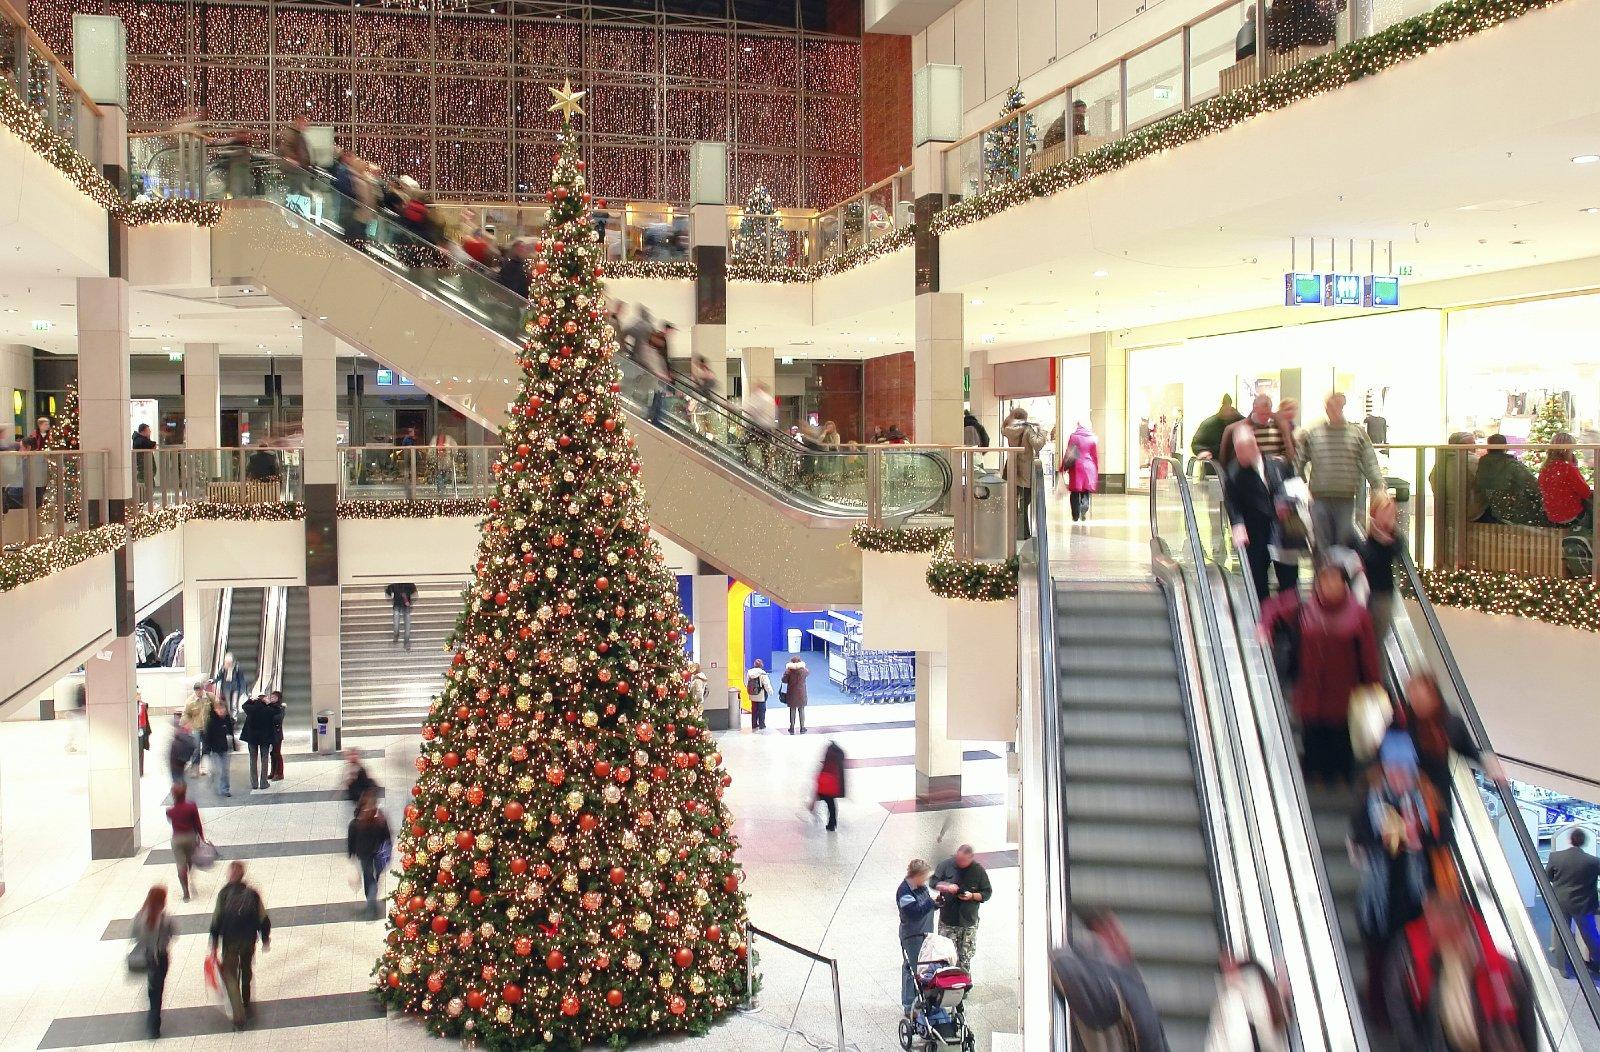 Bespoke shopping centre Christmas tree